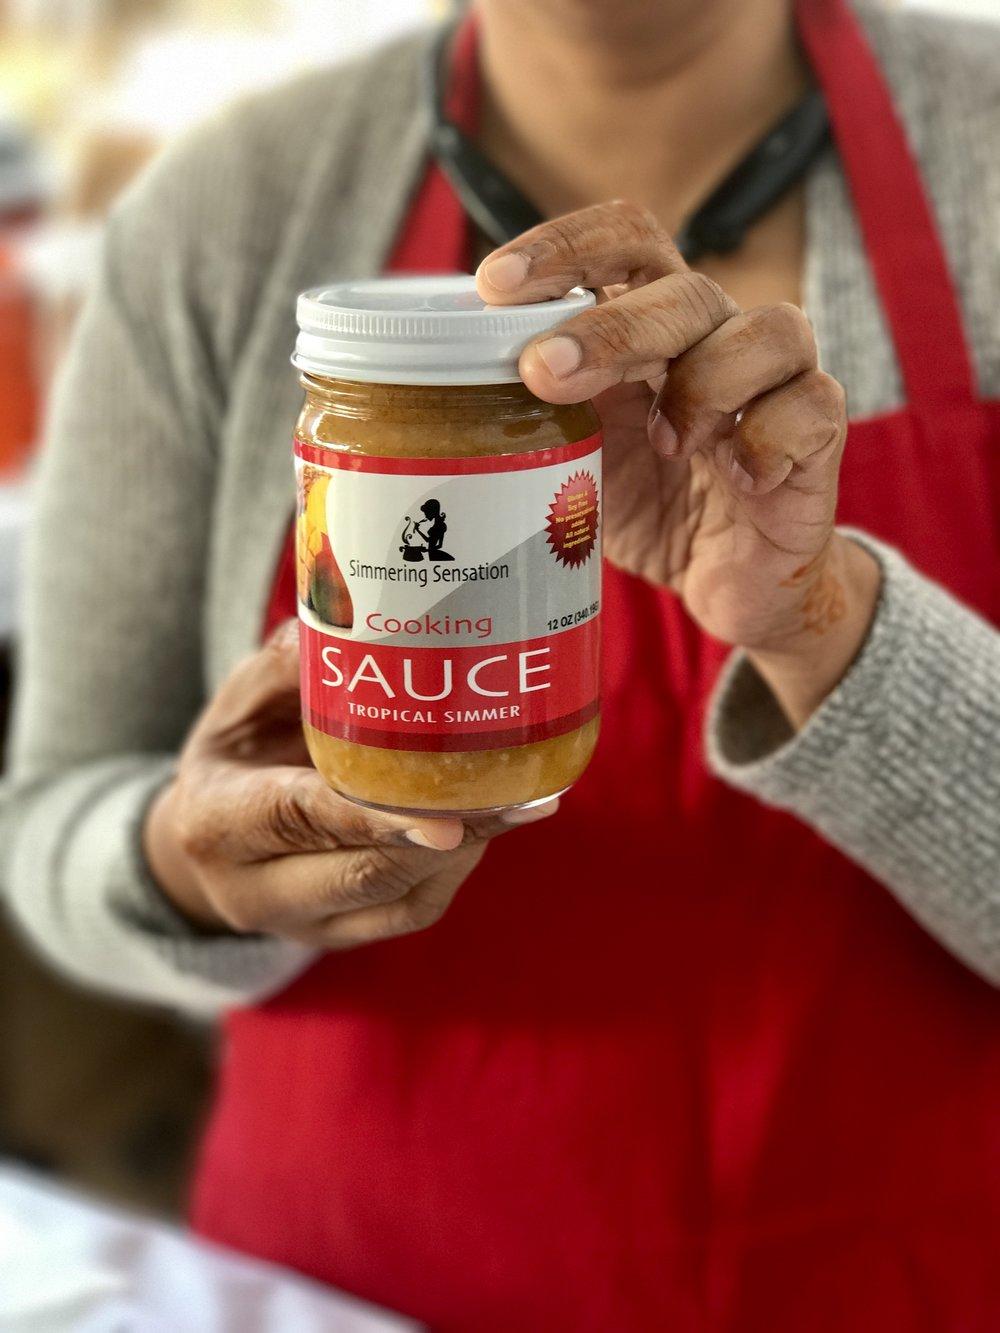 Simmering Sensation Sauces food vertical.jpg